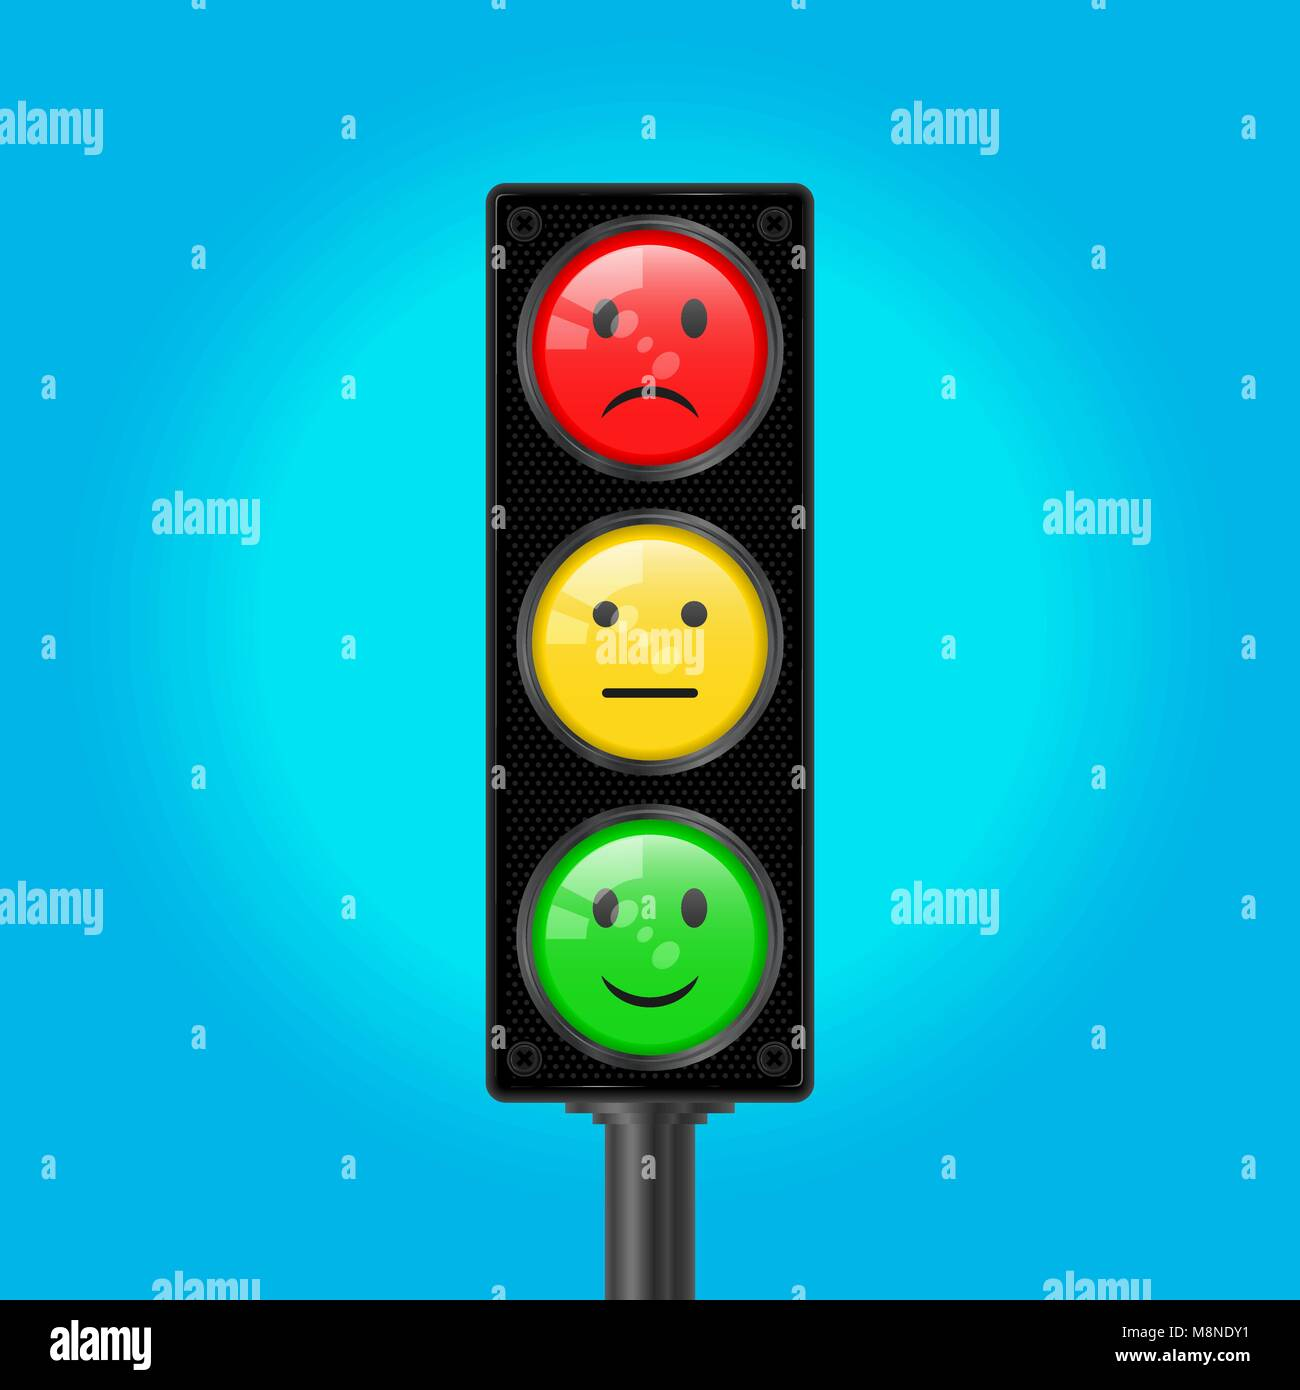 Traffic Lights with Emoticons, Vector Illustration Stock Vector